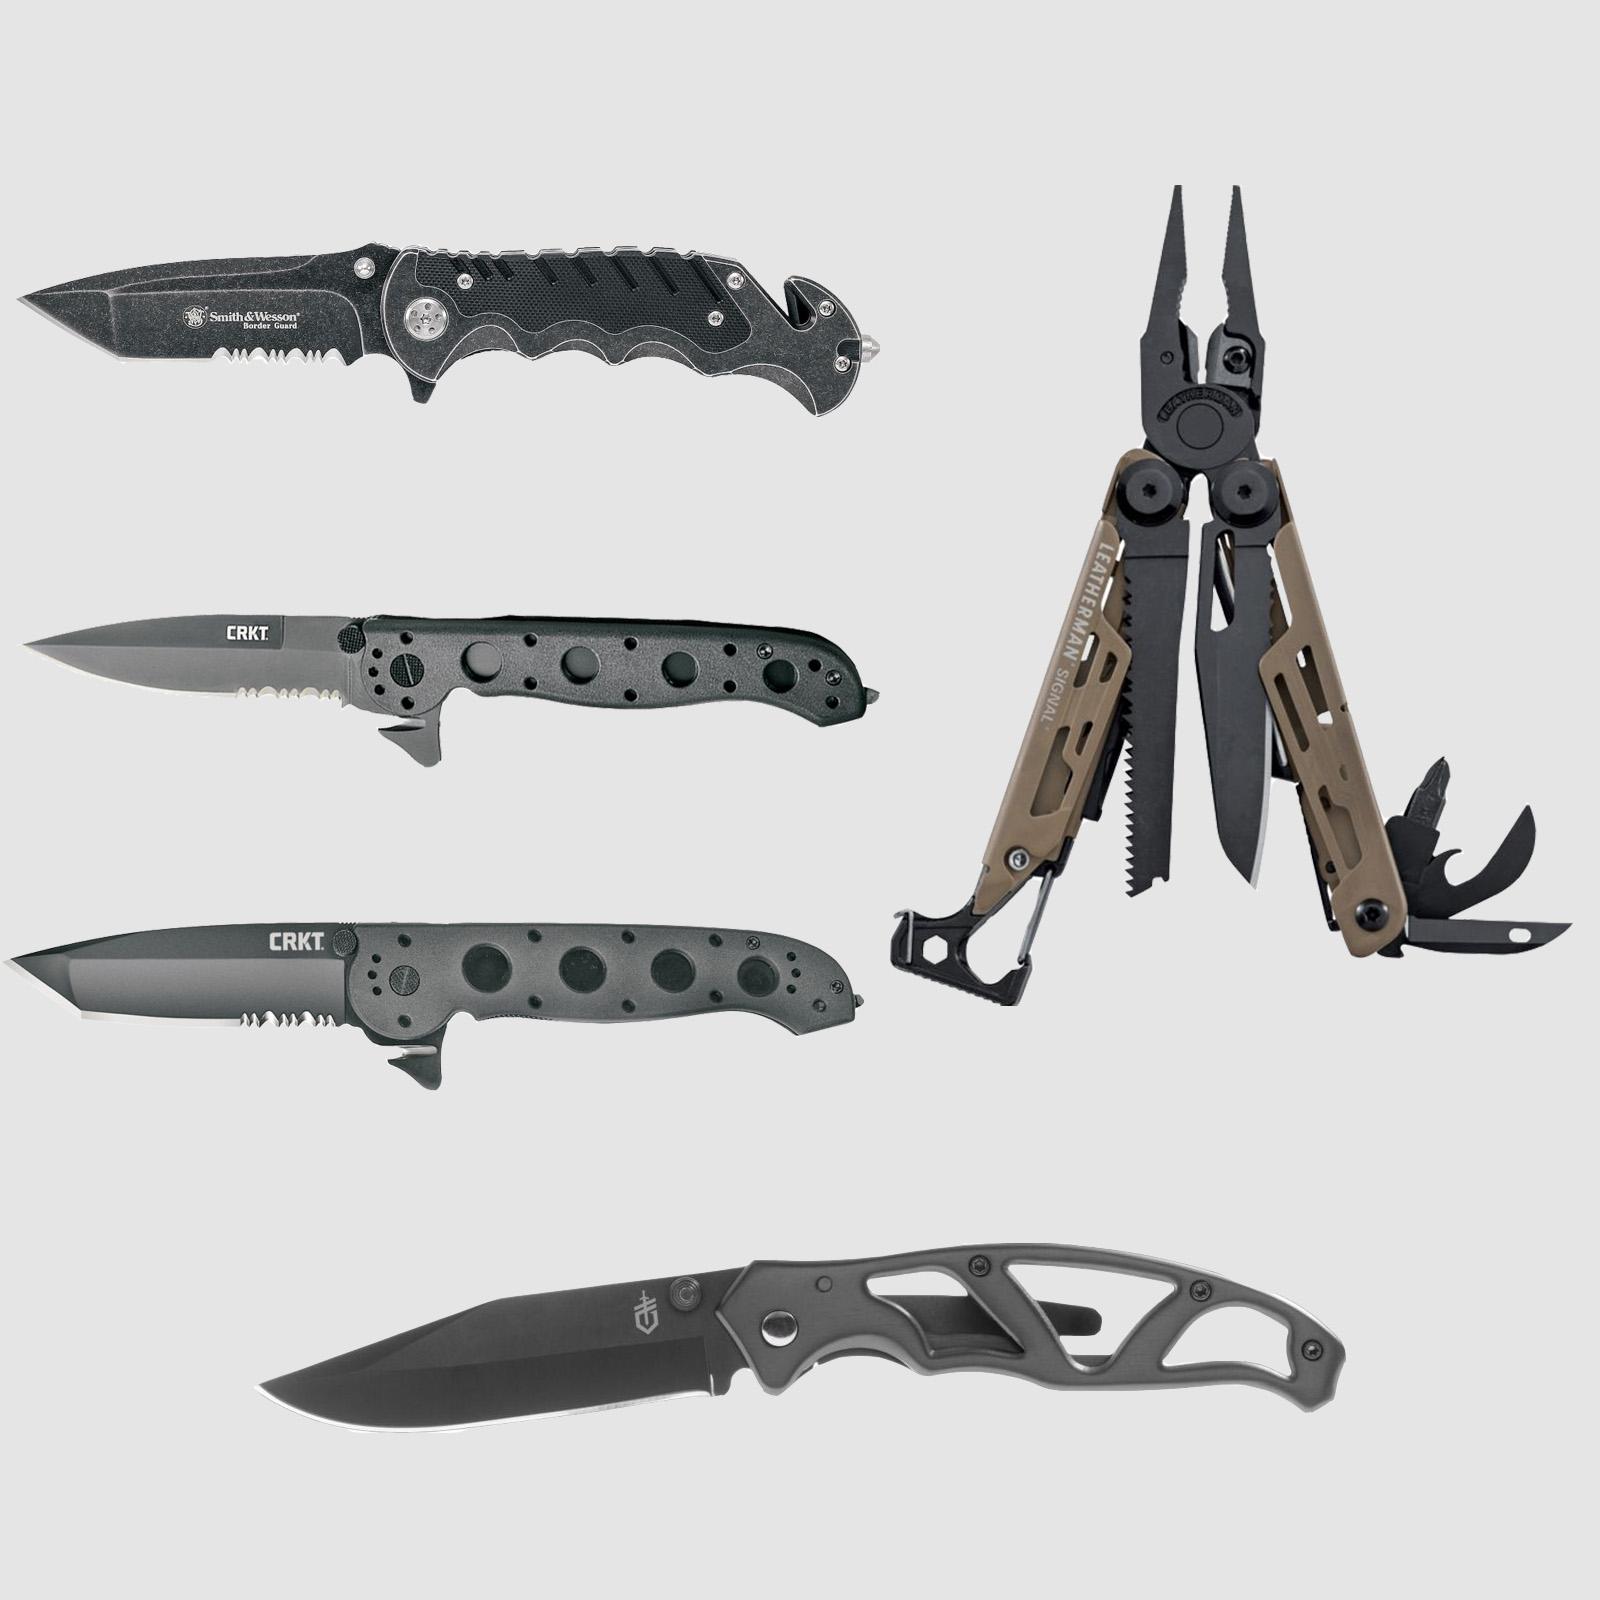 Cabela's Knife Sale | $9 - $90